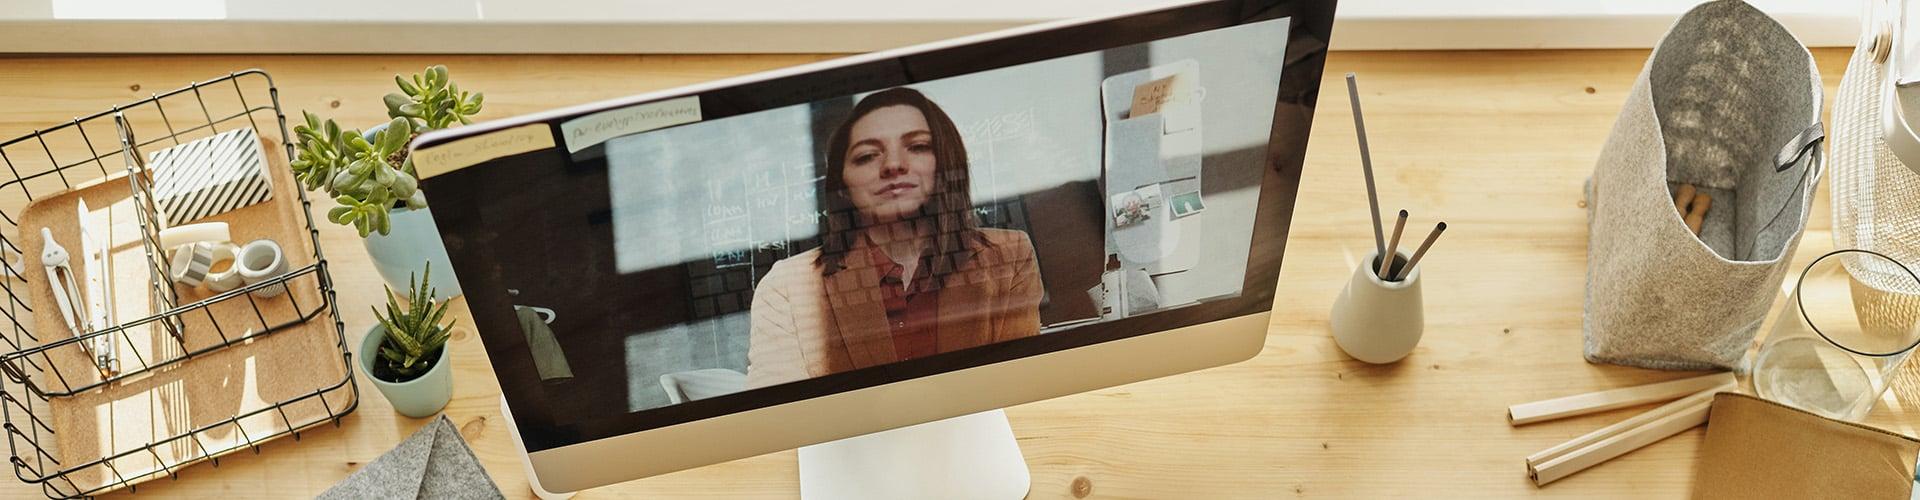 video-call-telehealth-woman-on-screen